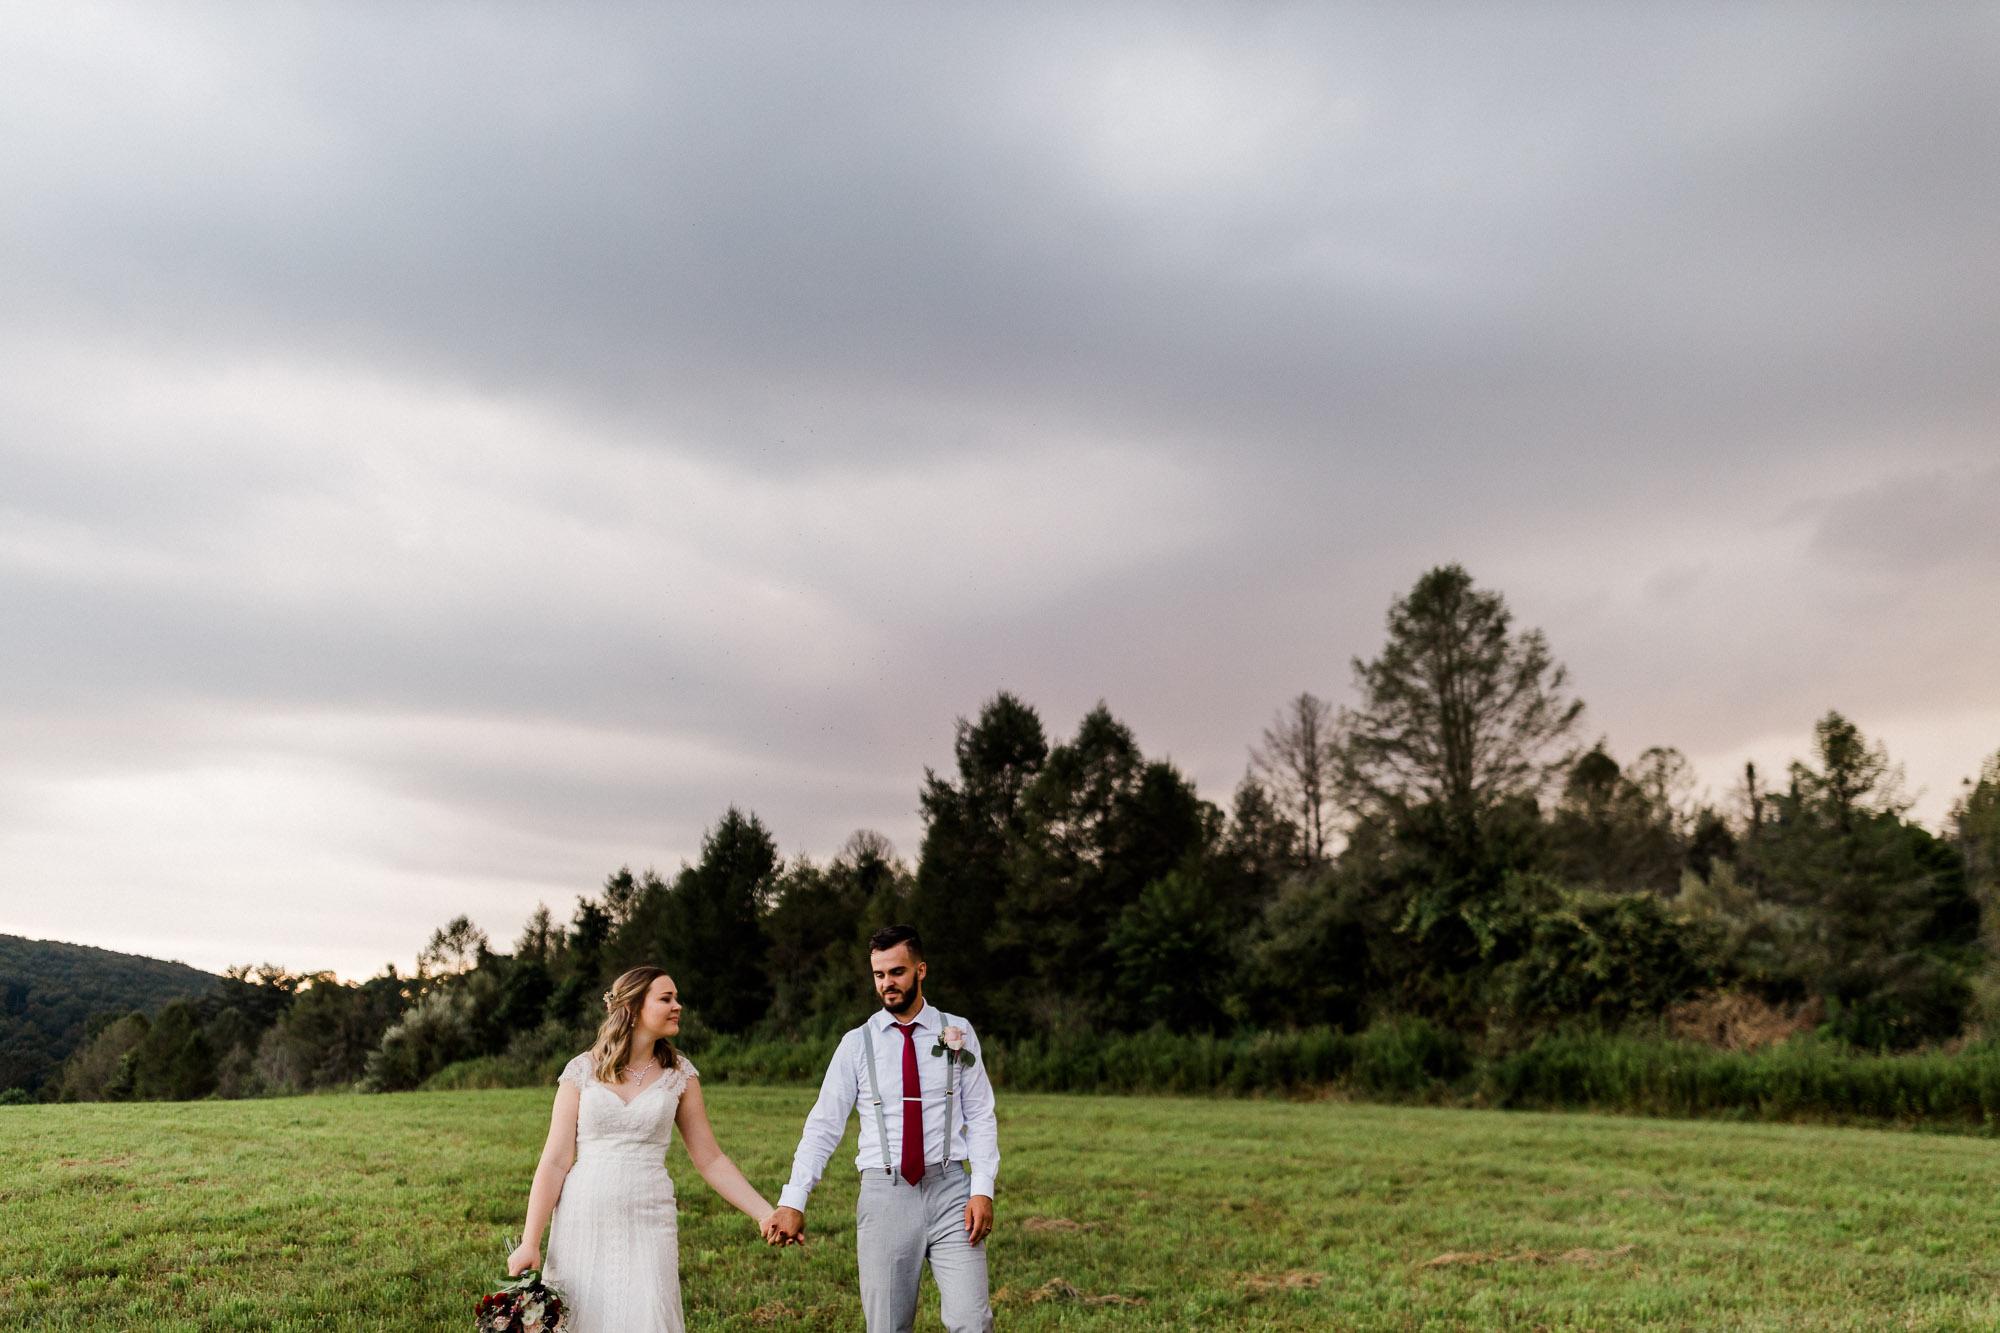 Stillwater-Christian_Church_Wedding-2482.jpg